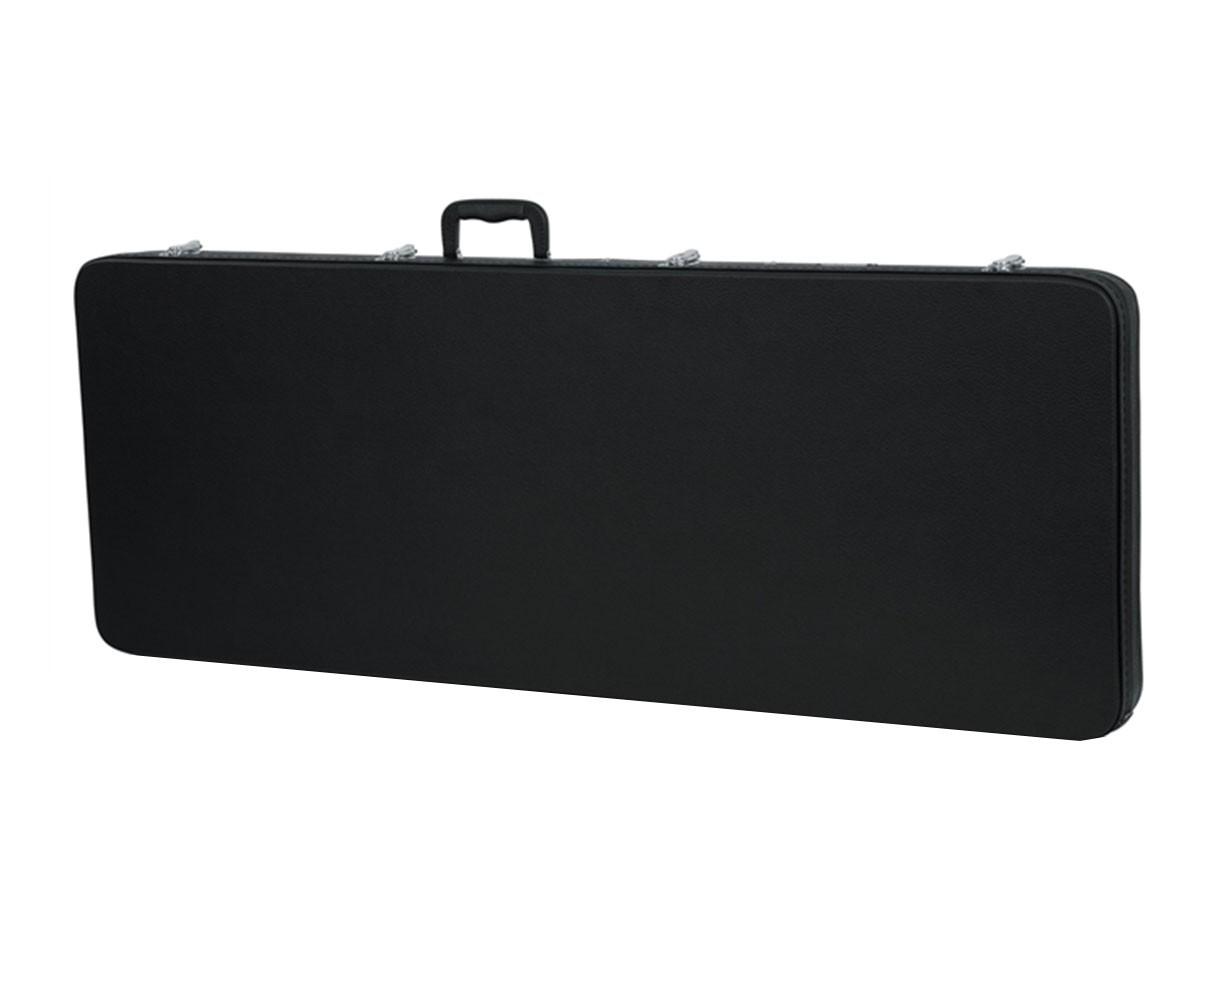 Gator Cases GWE-EXTREME Hard-Shell Case for Exterme Guitars - Flying V / Explorer - Used